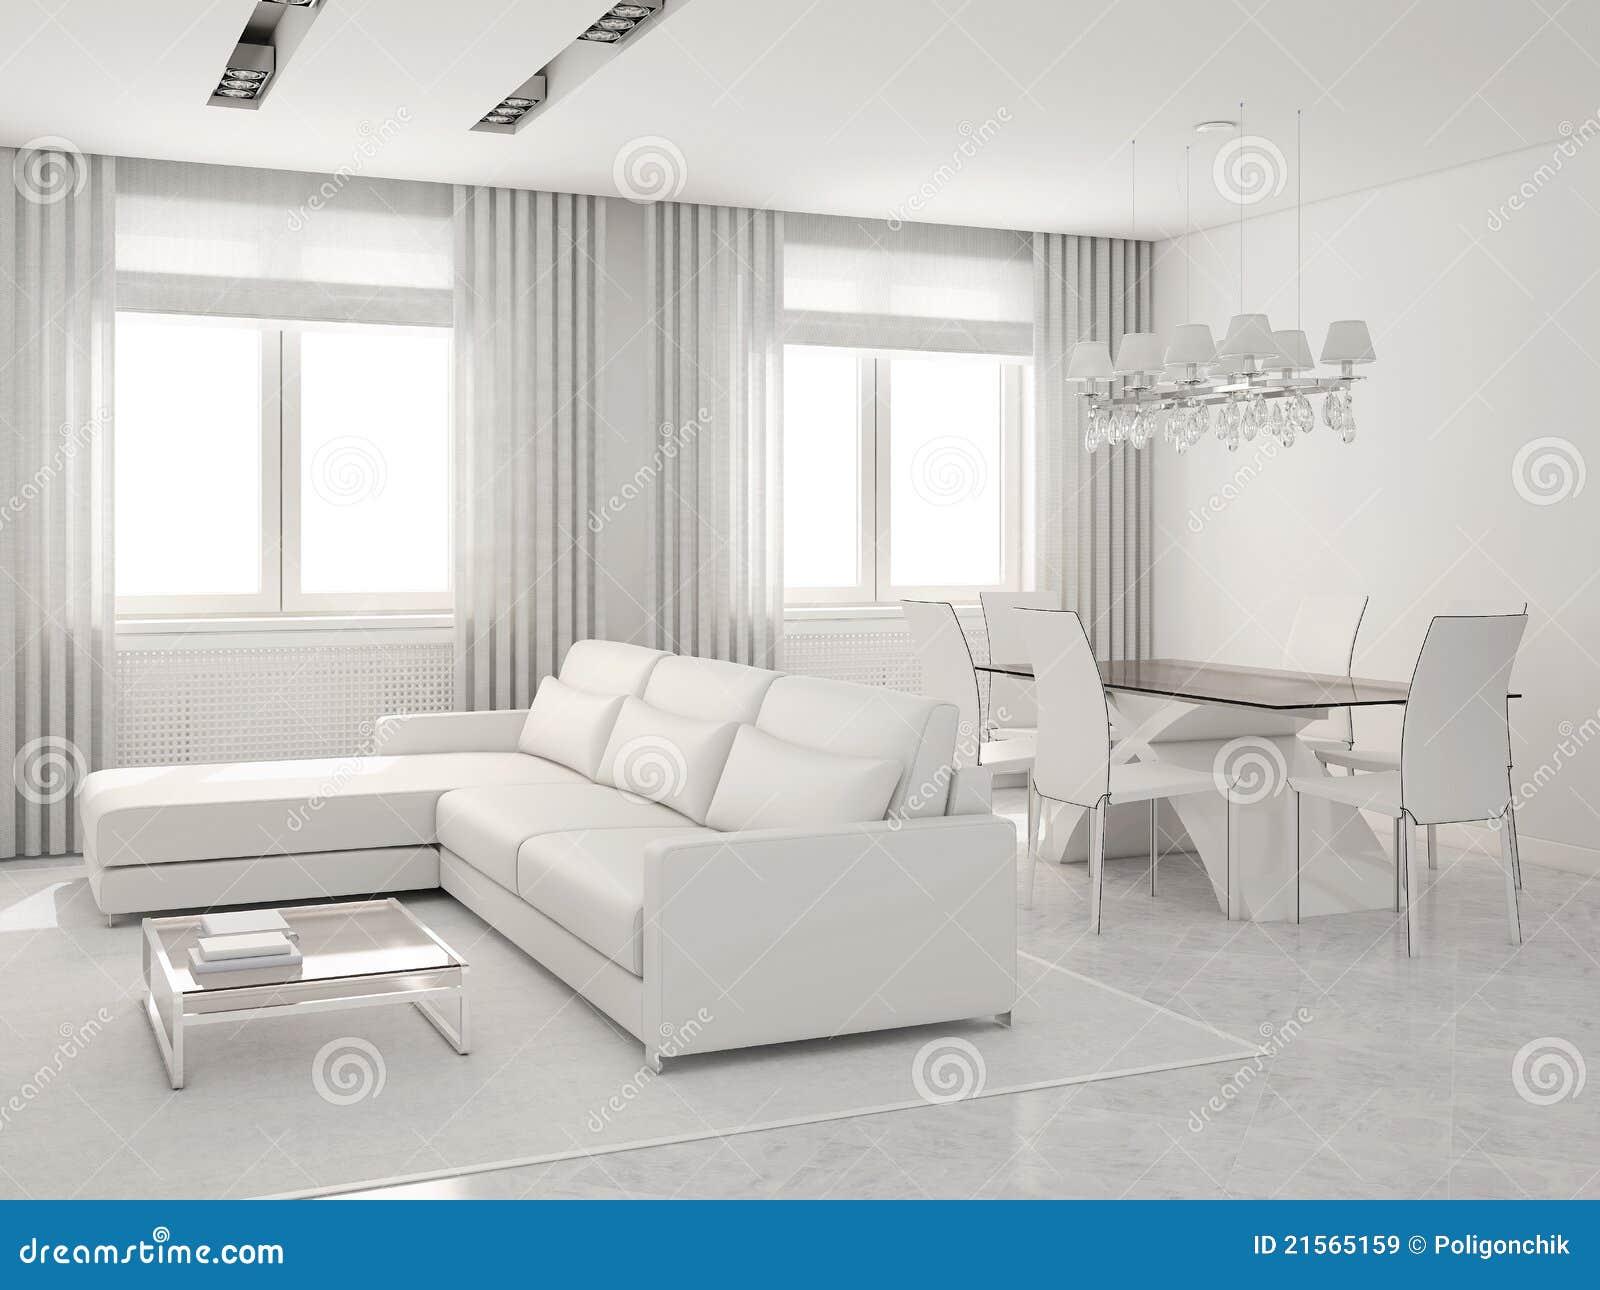 Modern binnenland van woonkamer en eetkamer royalty vrije stock afbeeldingen afbeelding 21565159 - Moderne eetkamer en woonkamer ...